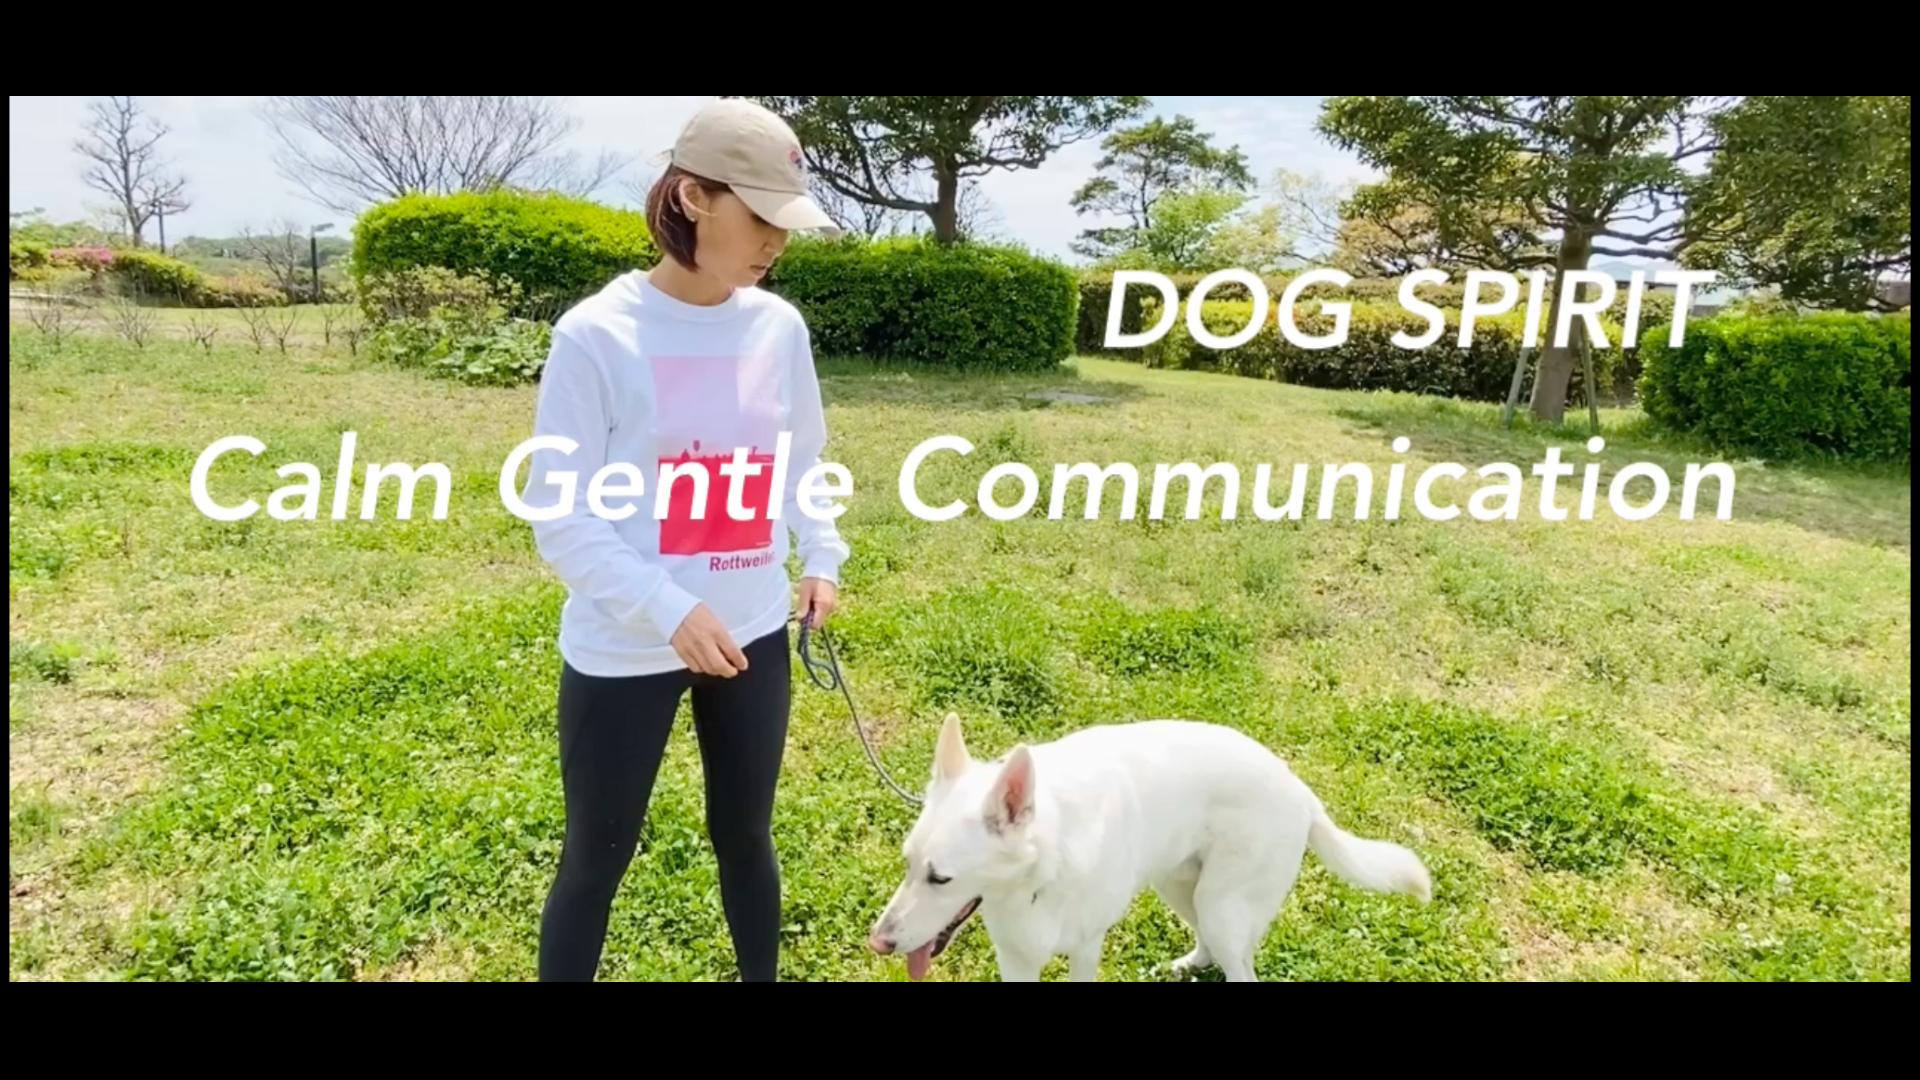 Calm Gentle Communication